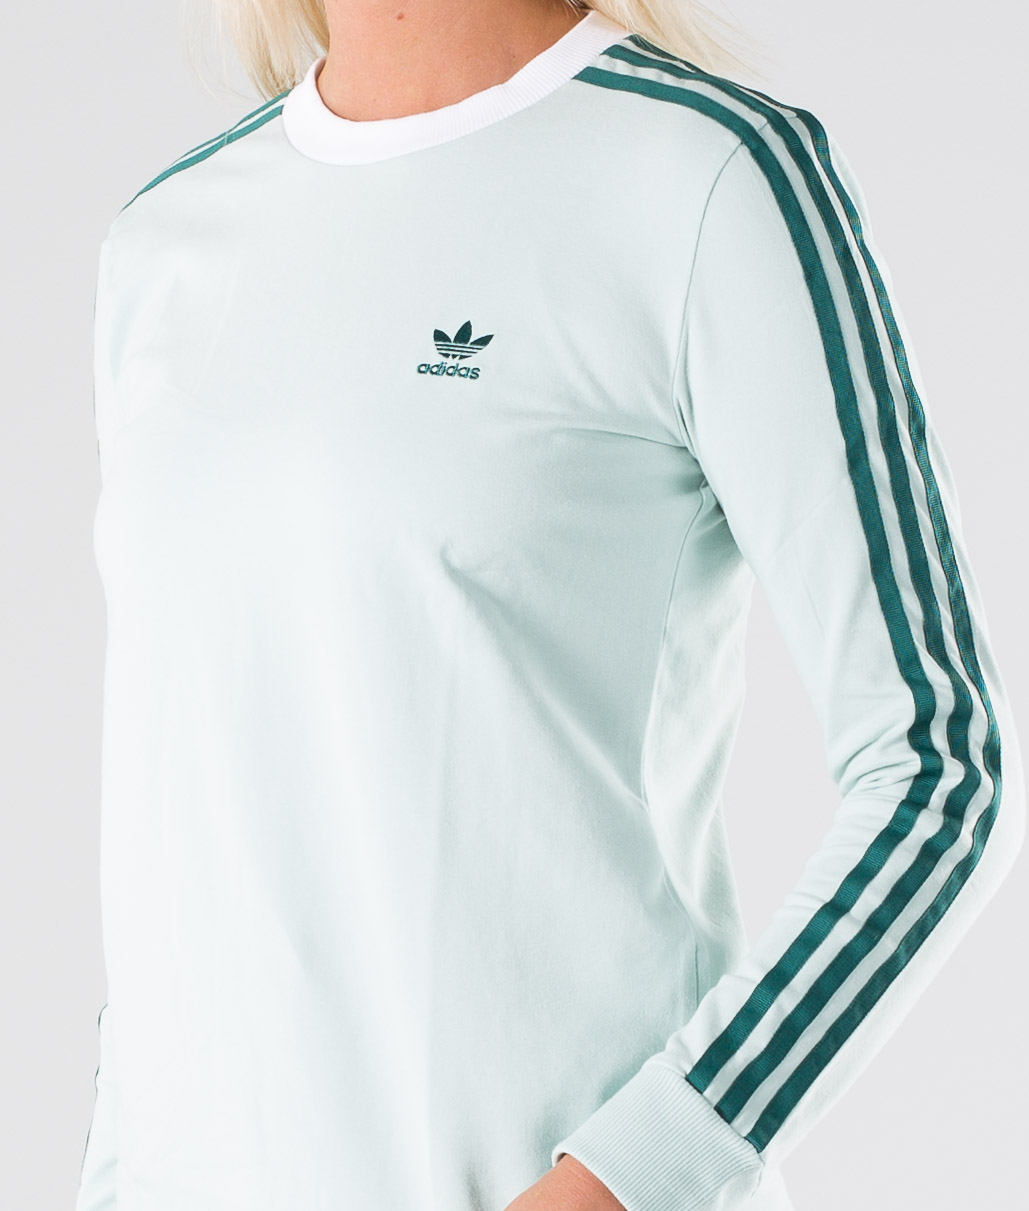 adidas 3 Stripes longsleeve white